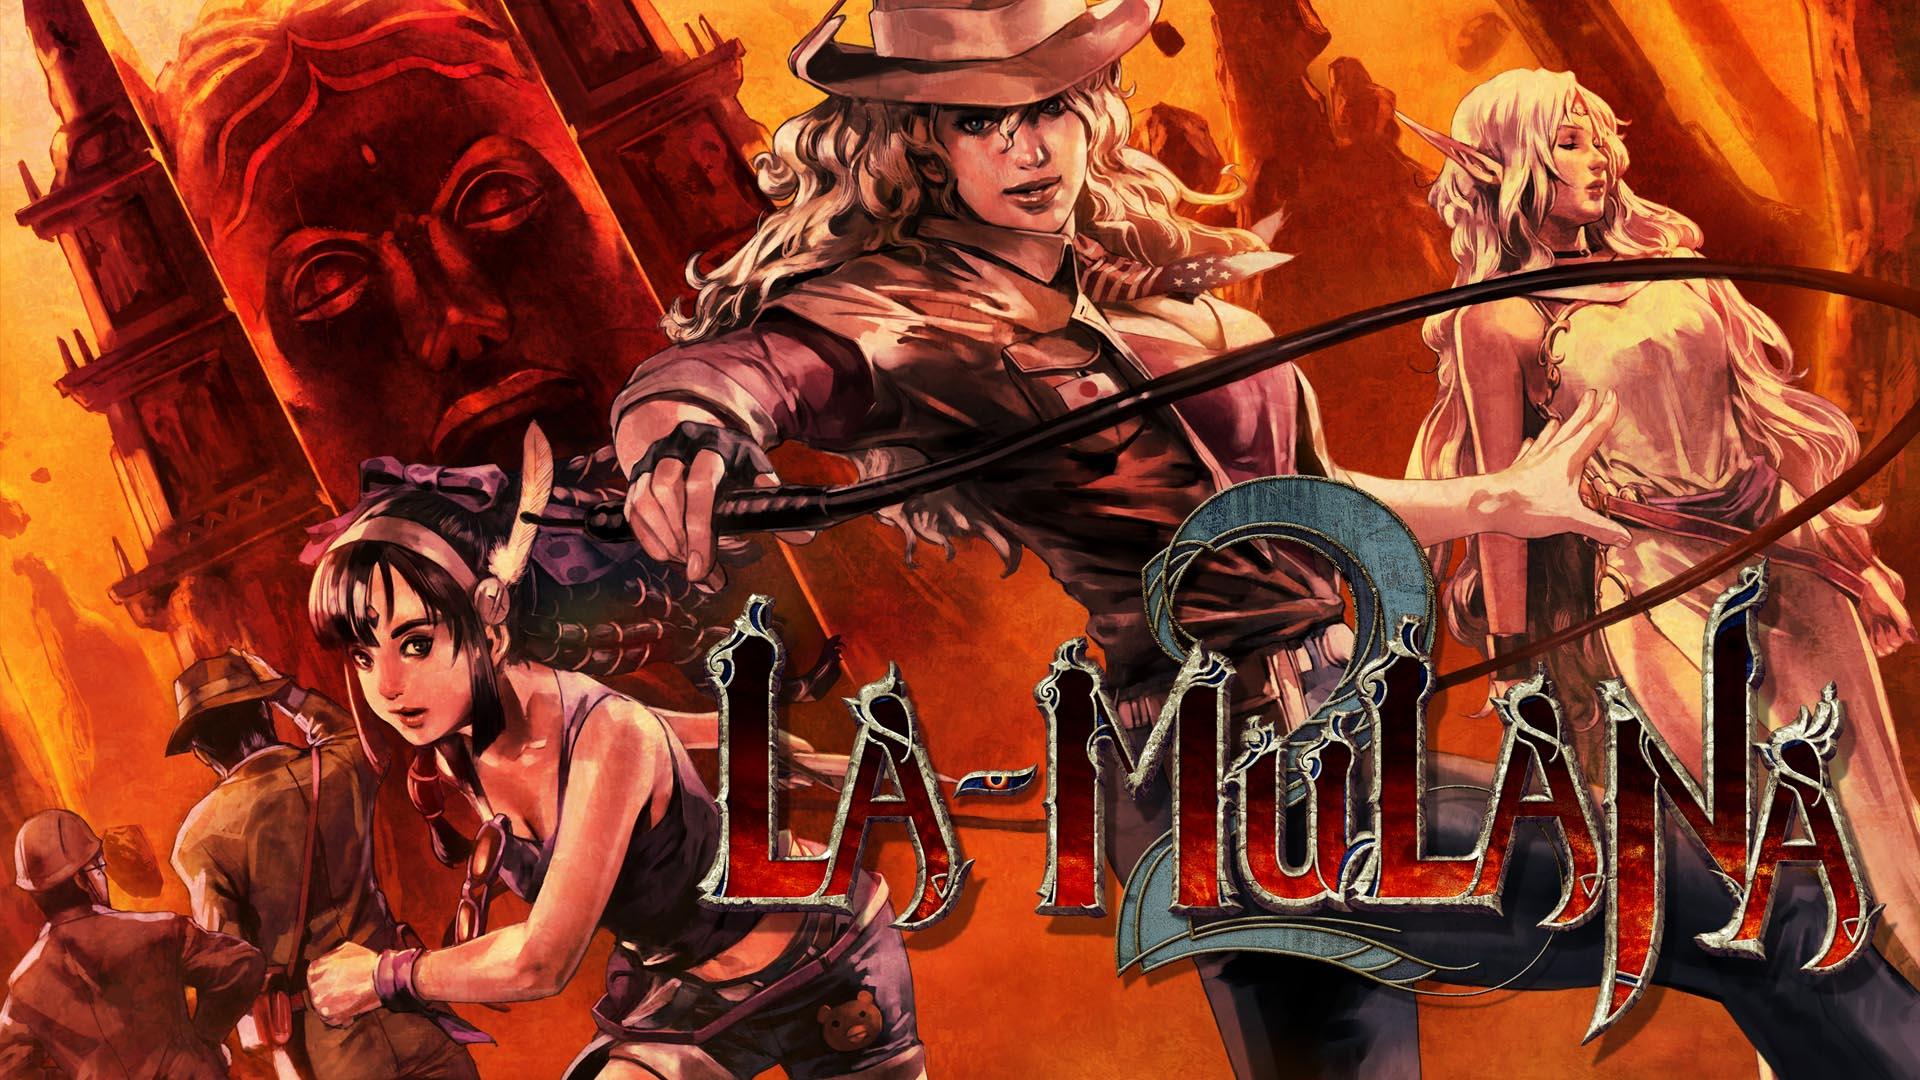 LA-Mulana Collection